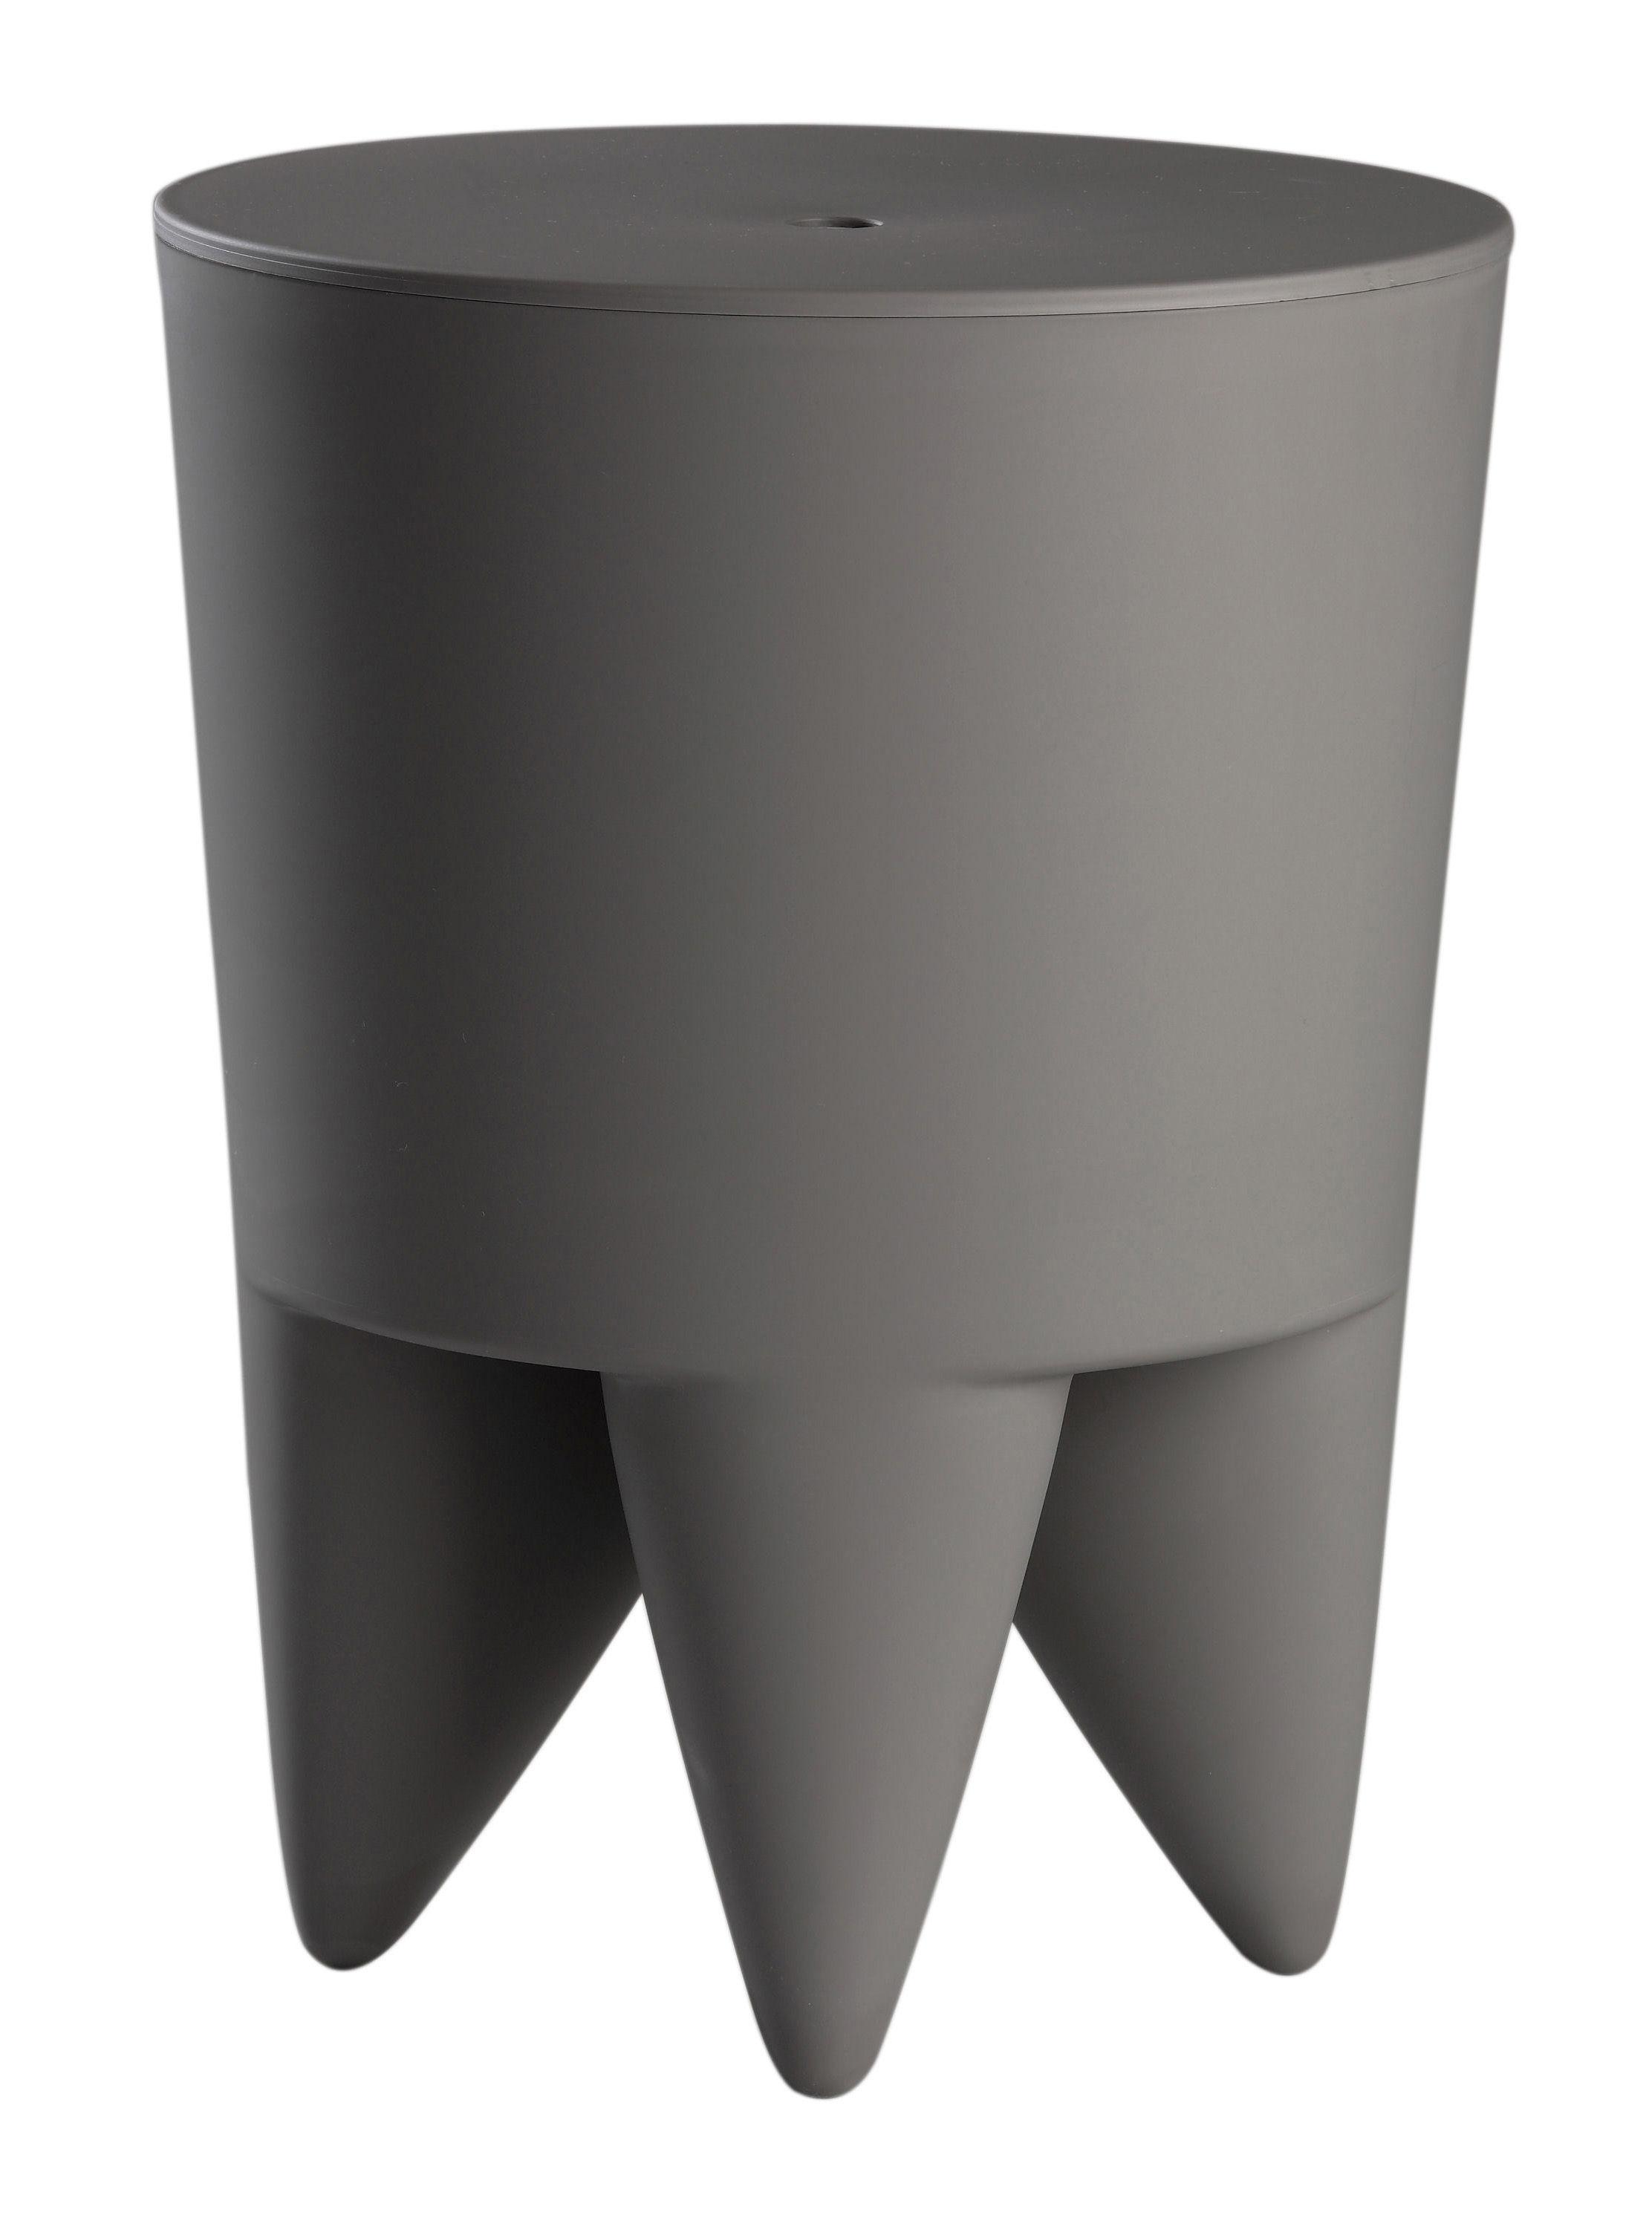 new bubu 1er hocker opak by xo made in design. Black Bedroom Furniture Sets. Home Design Ideas